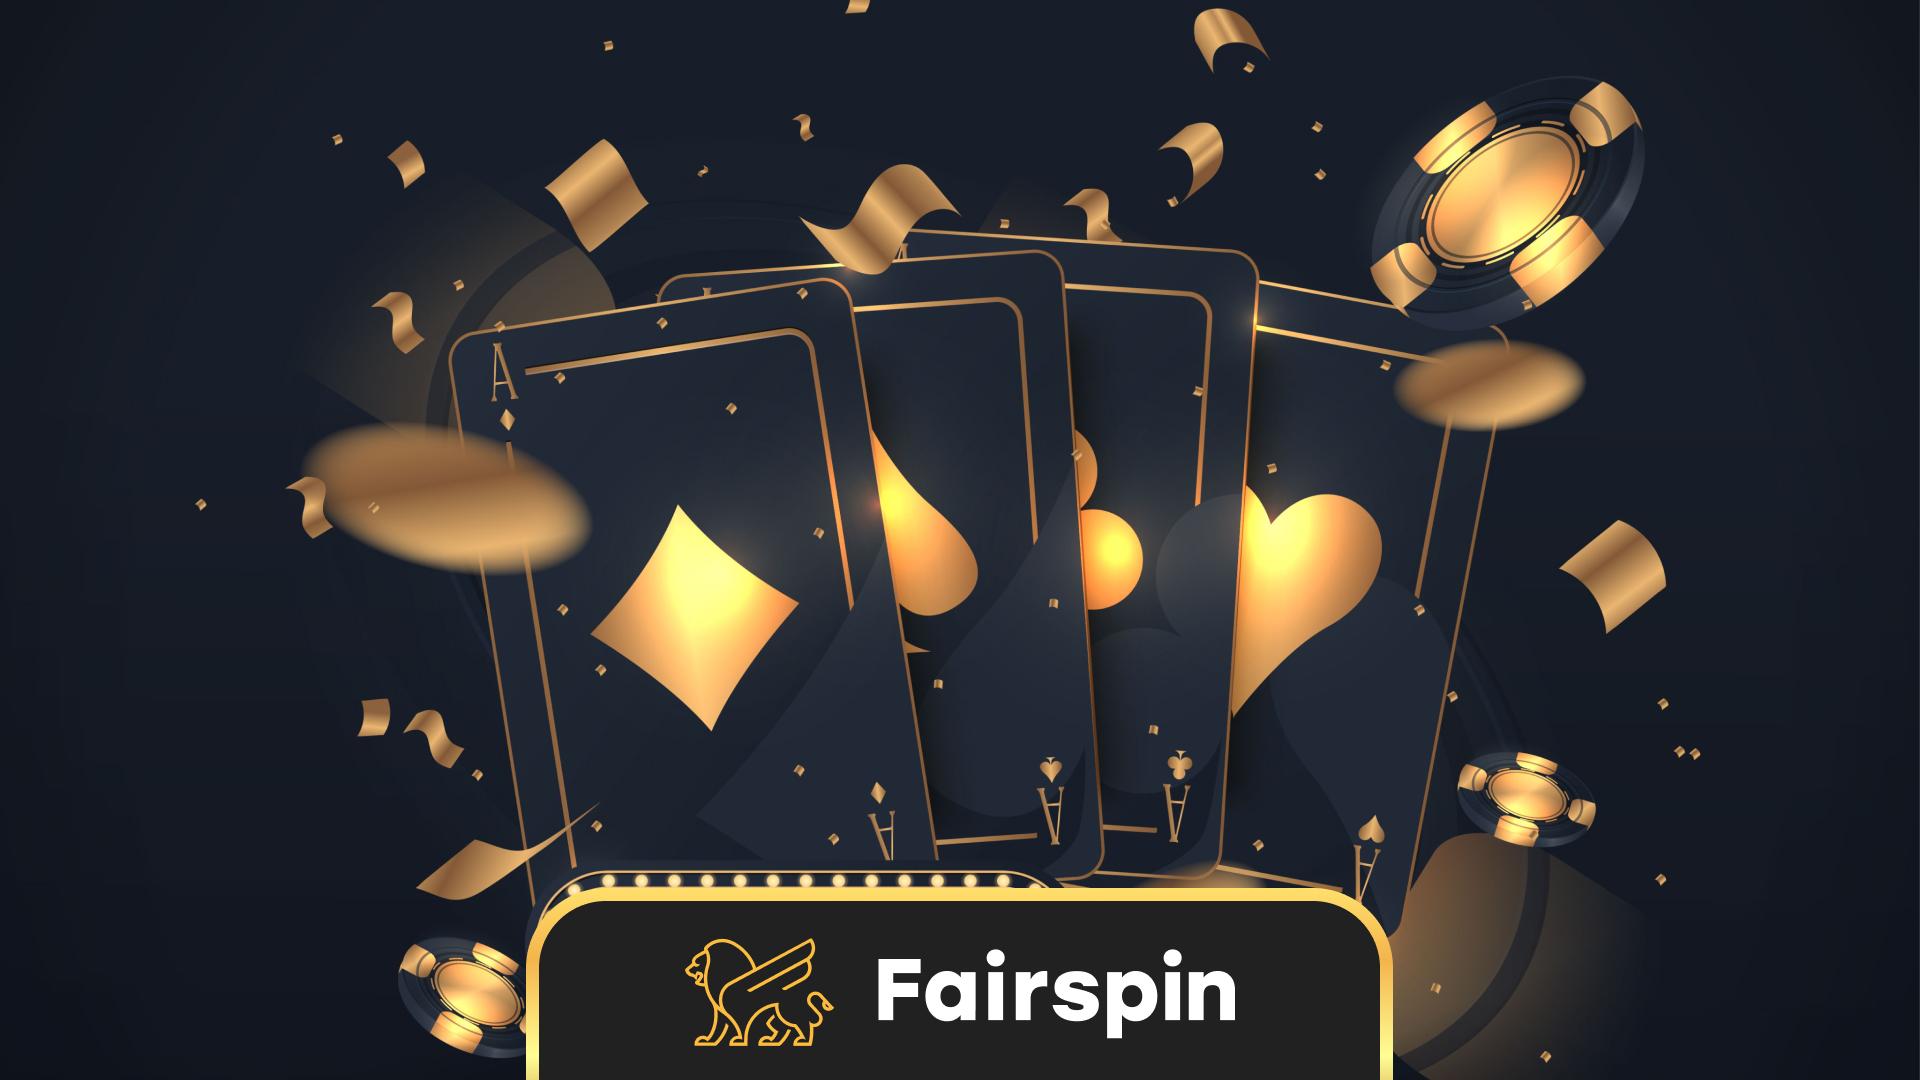 fairspin blockchain gaming